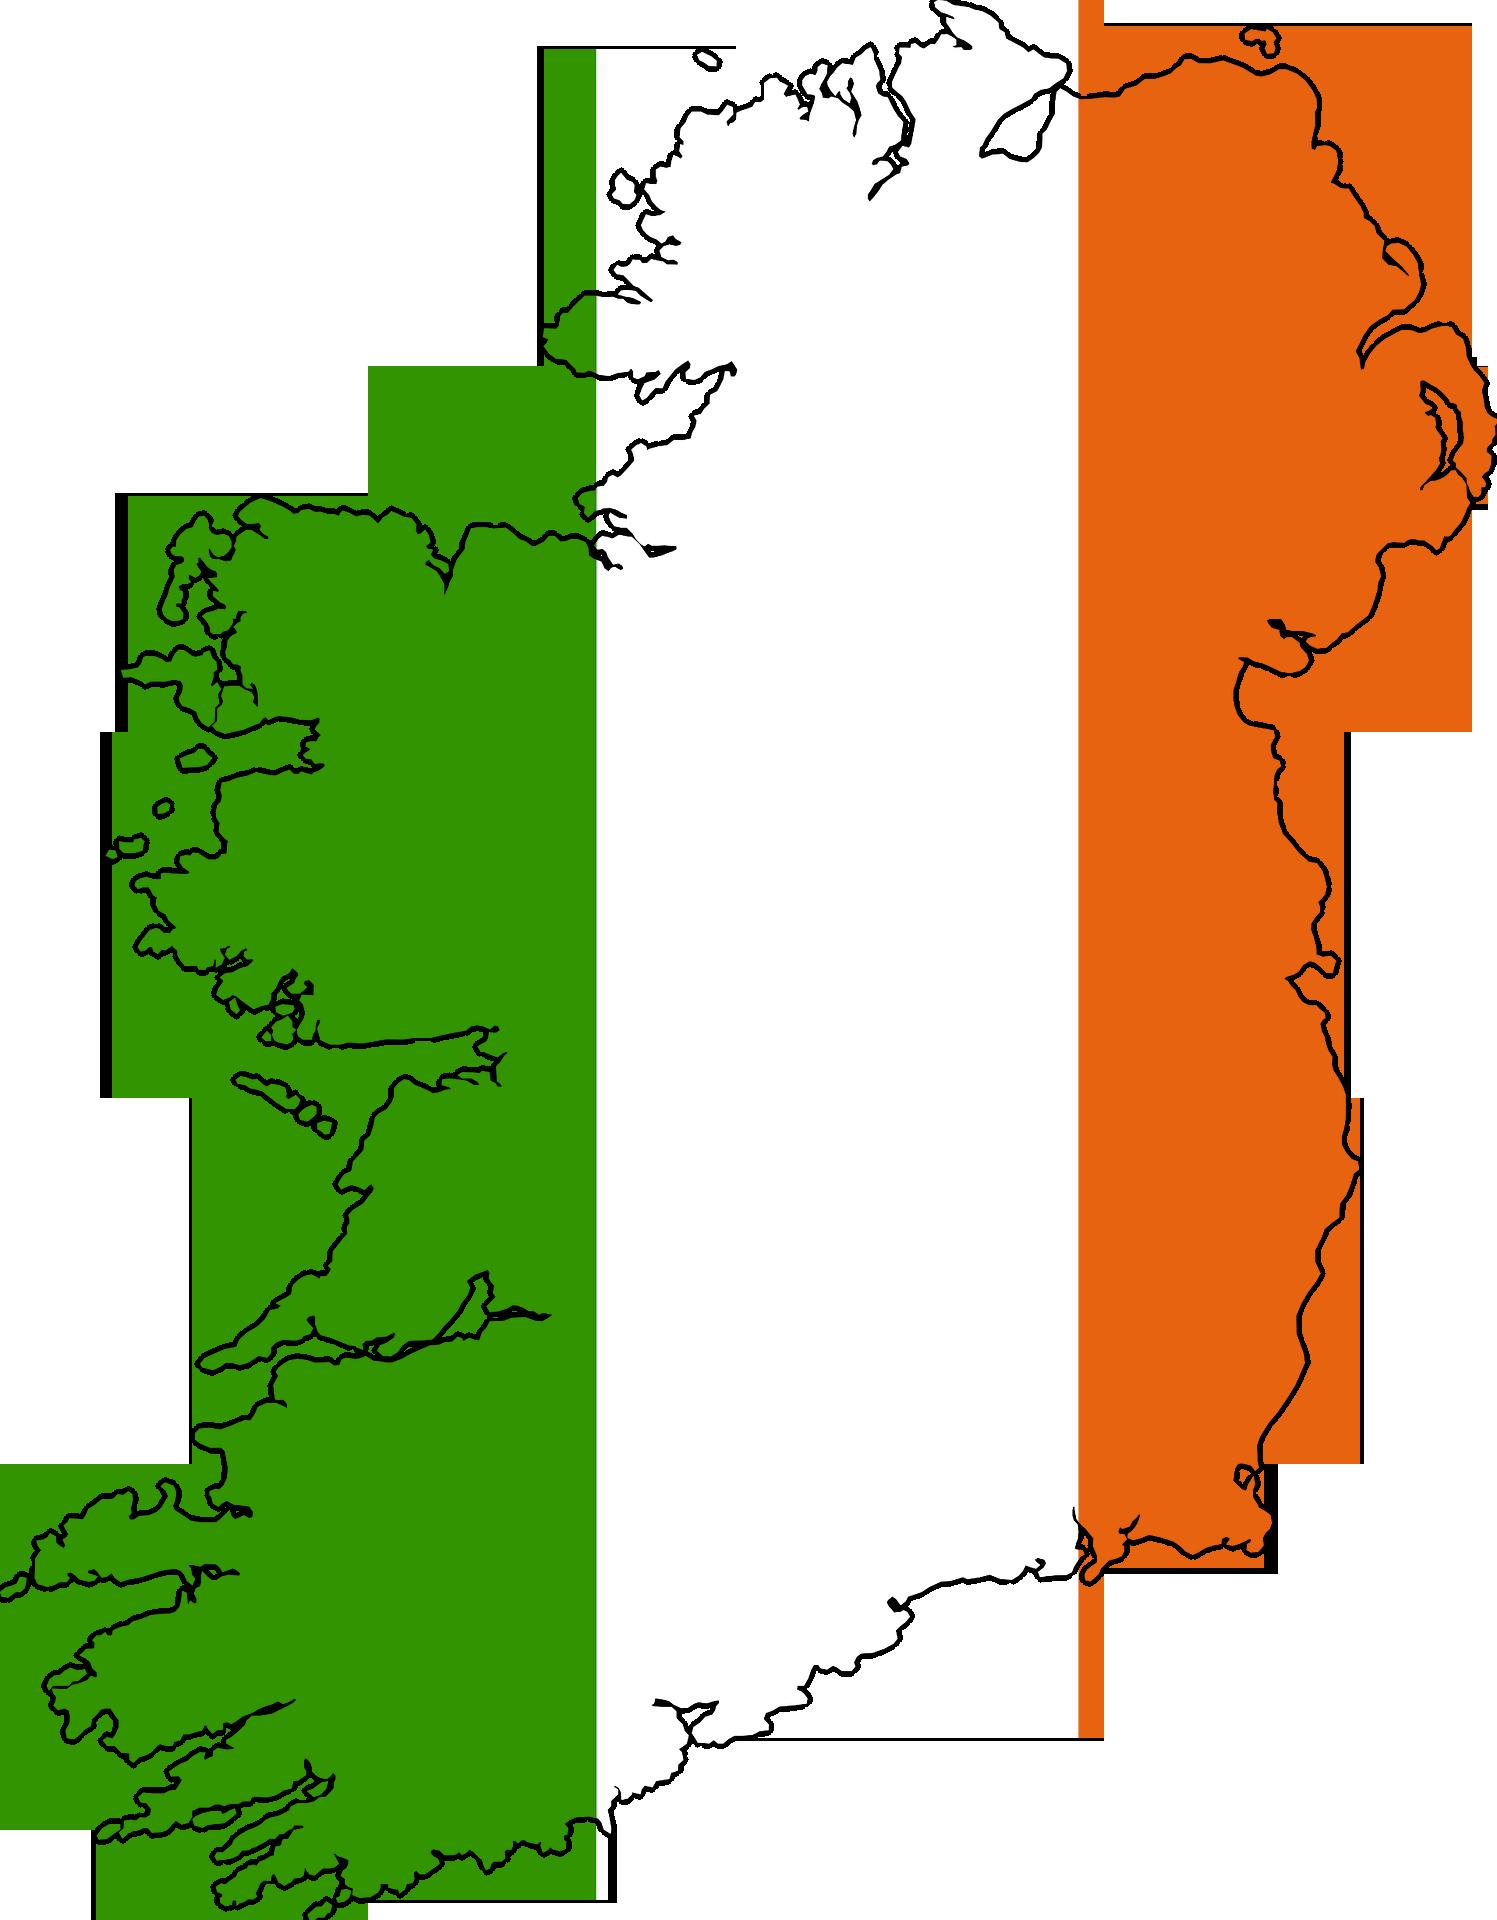 Map Of Ireland Drawing.Ireland Map Drawing Free Image